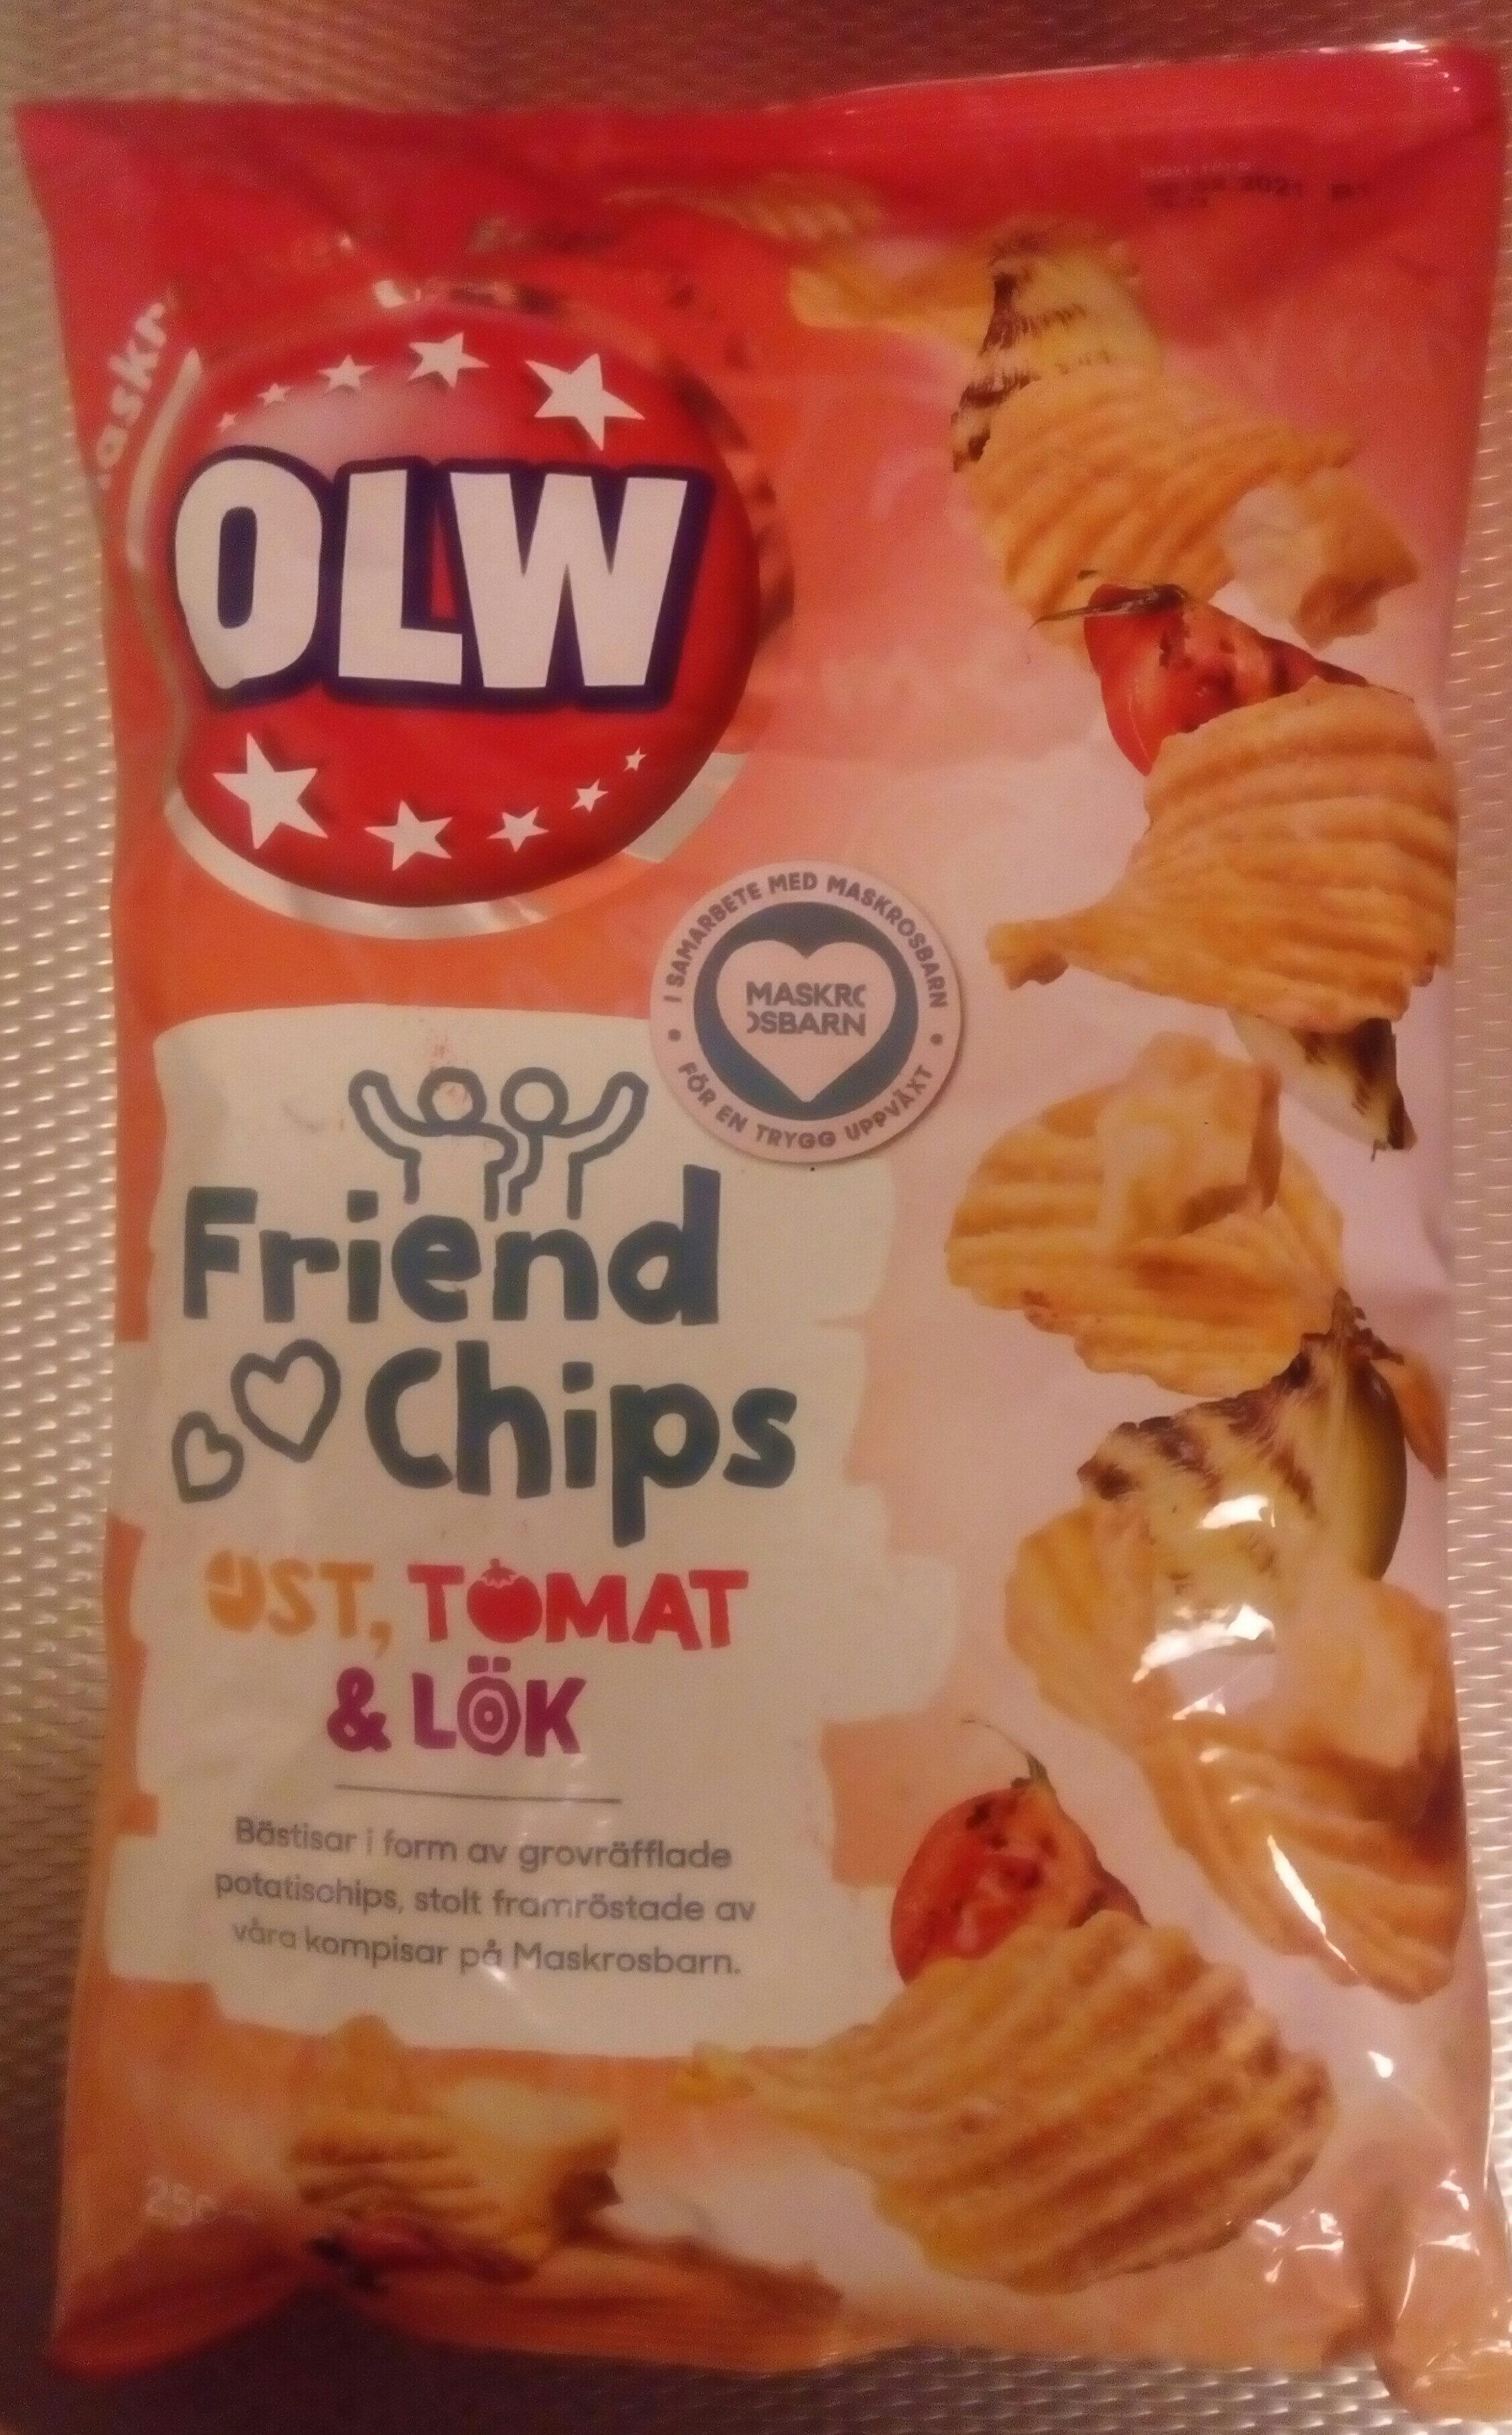 OLW Ost, tomat & lök Maskrosbarn Edition - Produit - sv